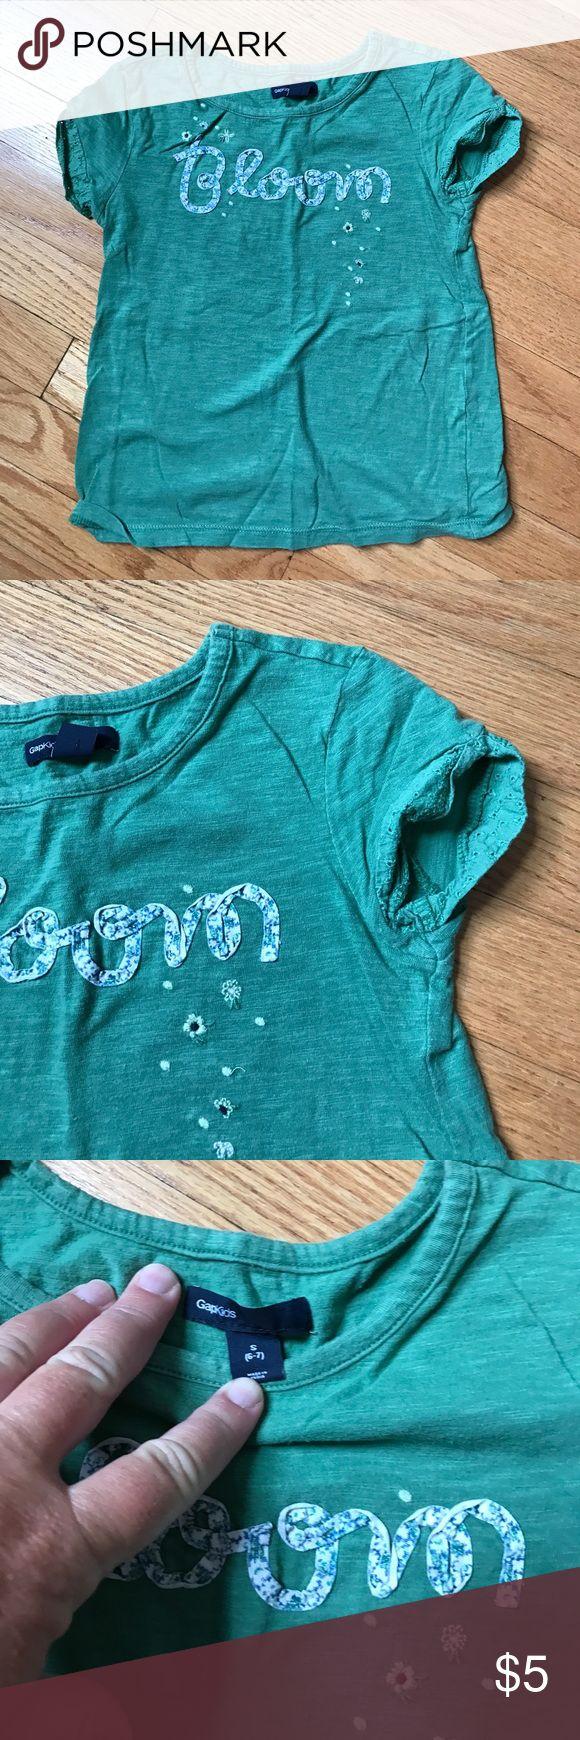 Girls Gap tshirt Bloom! GAP Shirts & Tops Tees - Short Sleeve